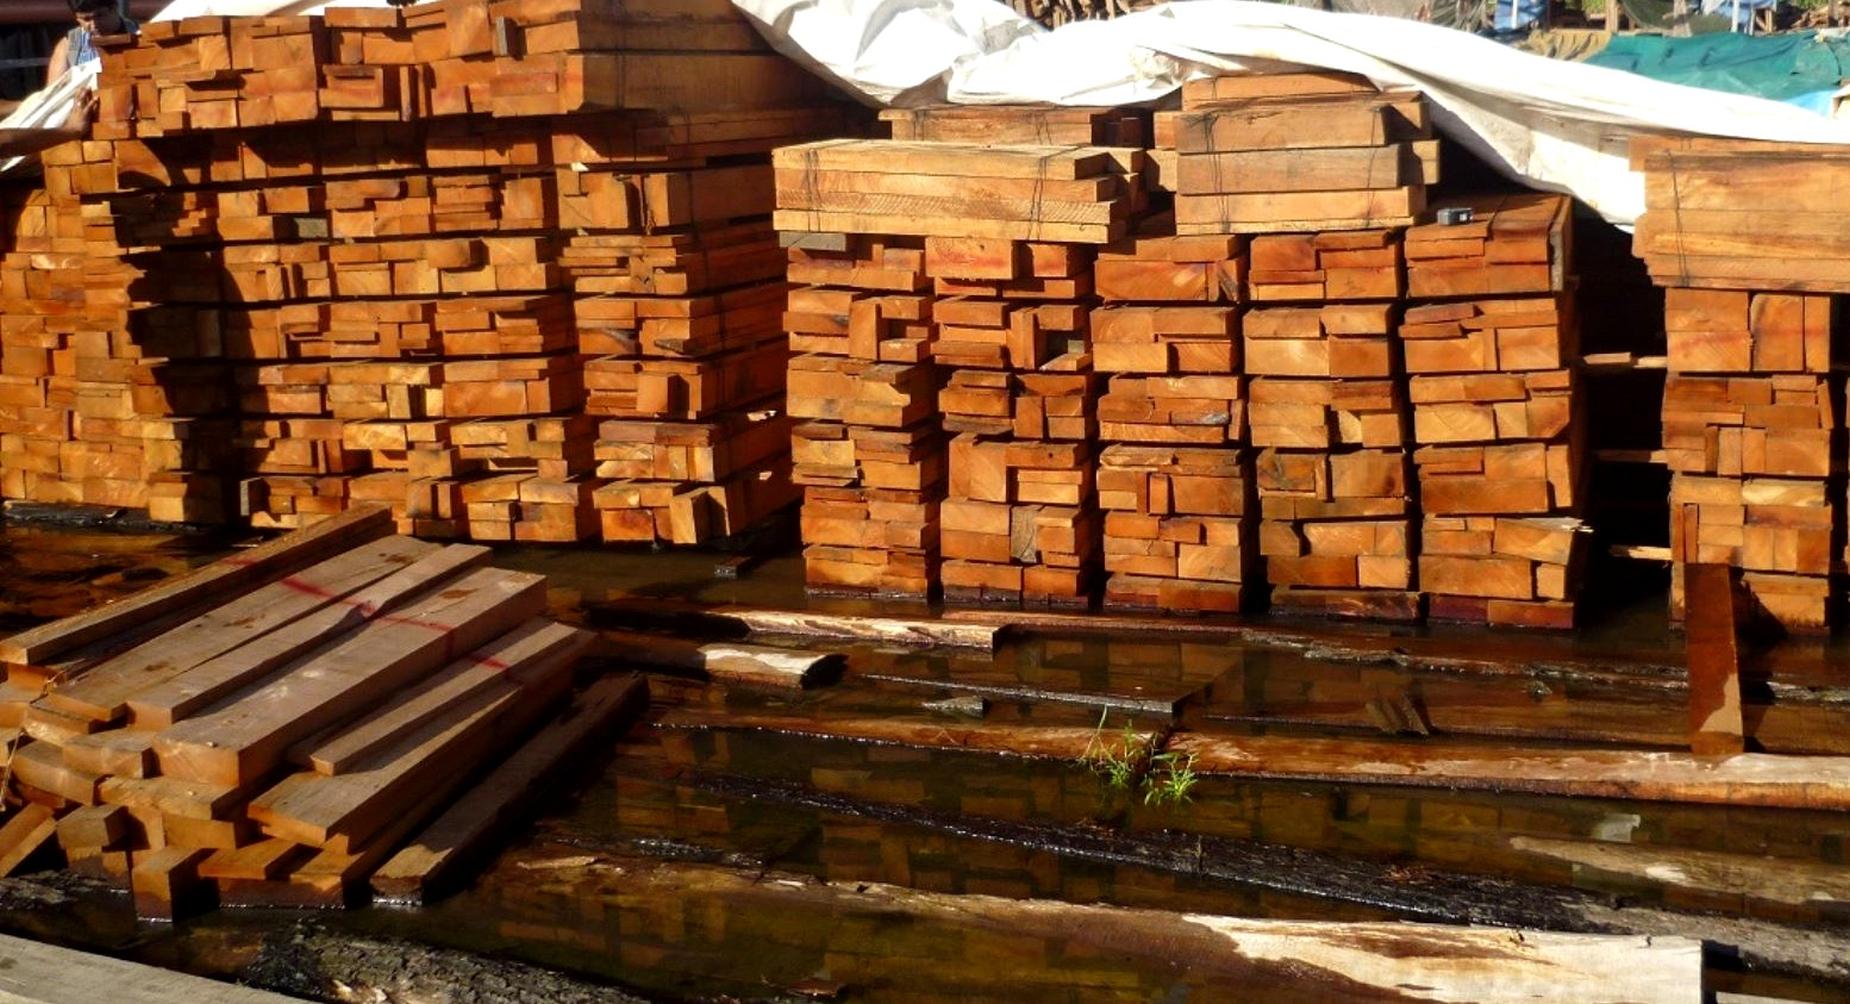 Estados Unidos extiende bloqueo a empresa investigada por tráfico ilegal de  madera | Ojo Público